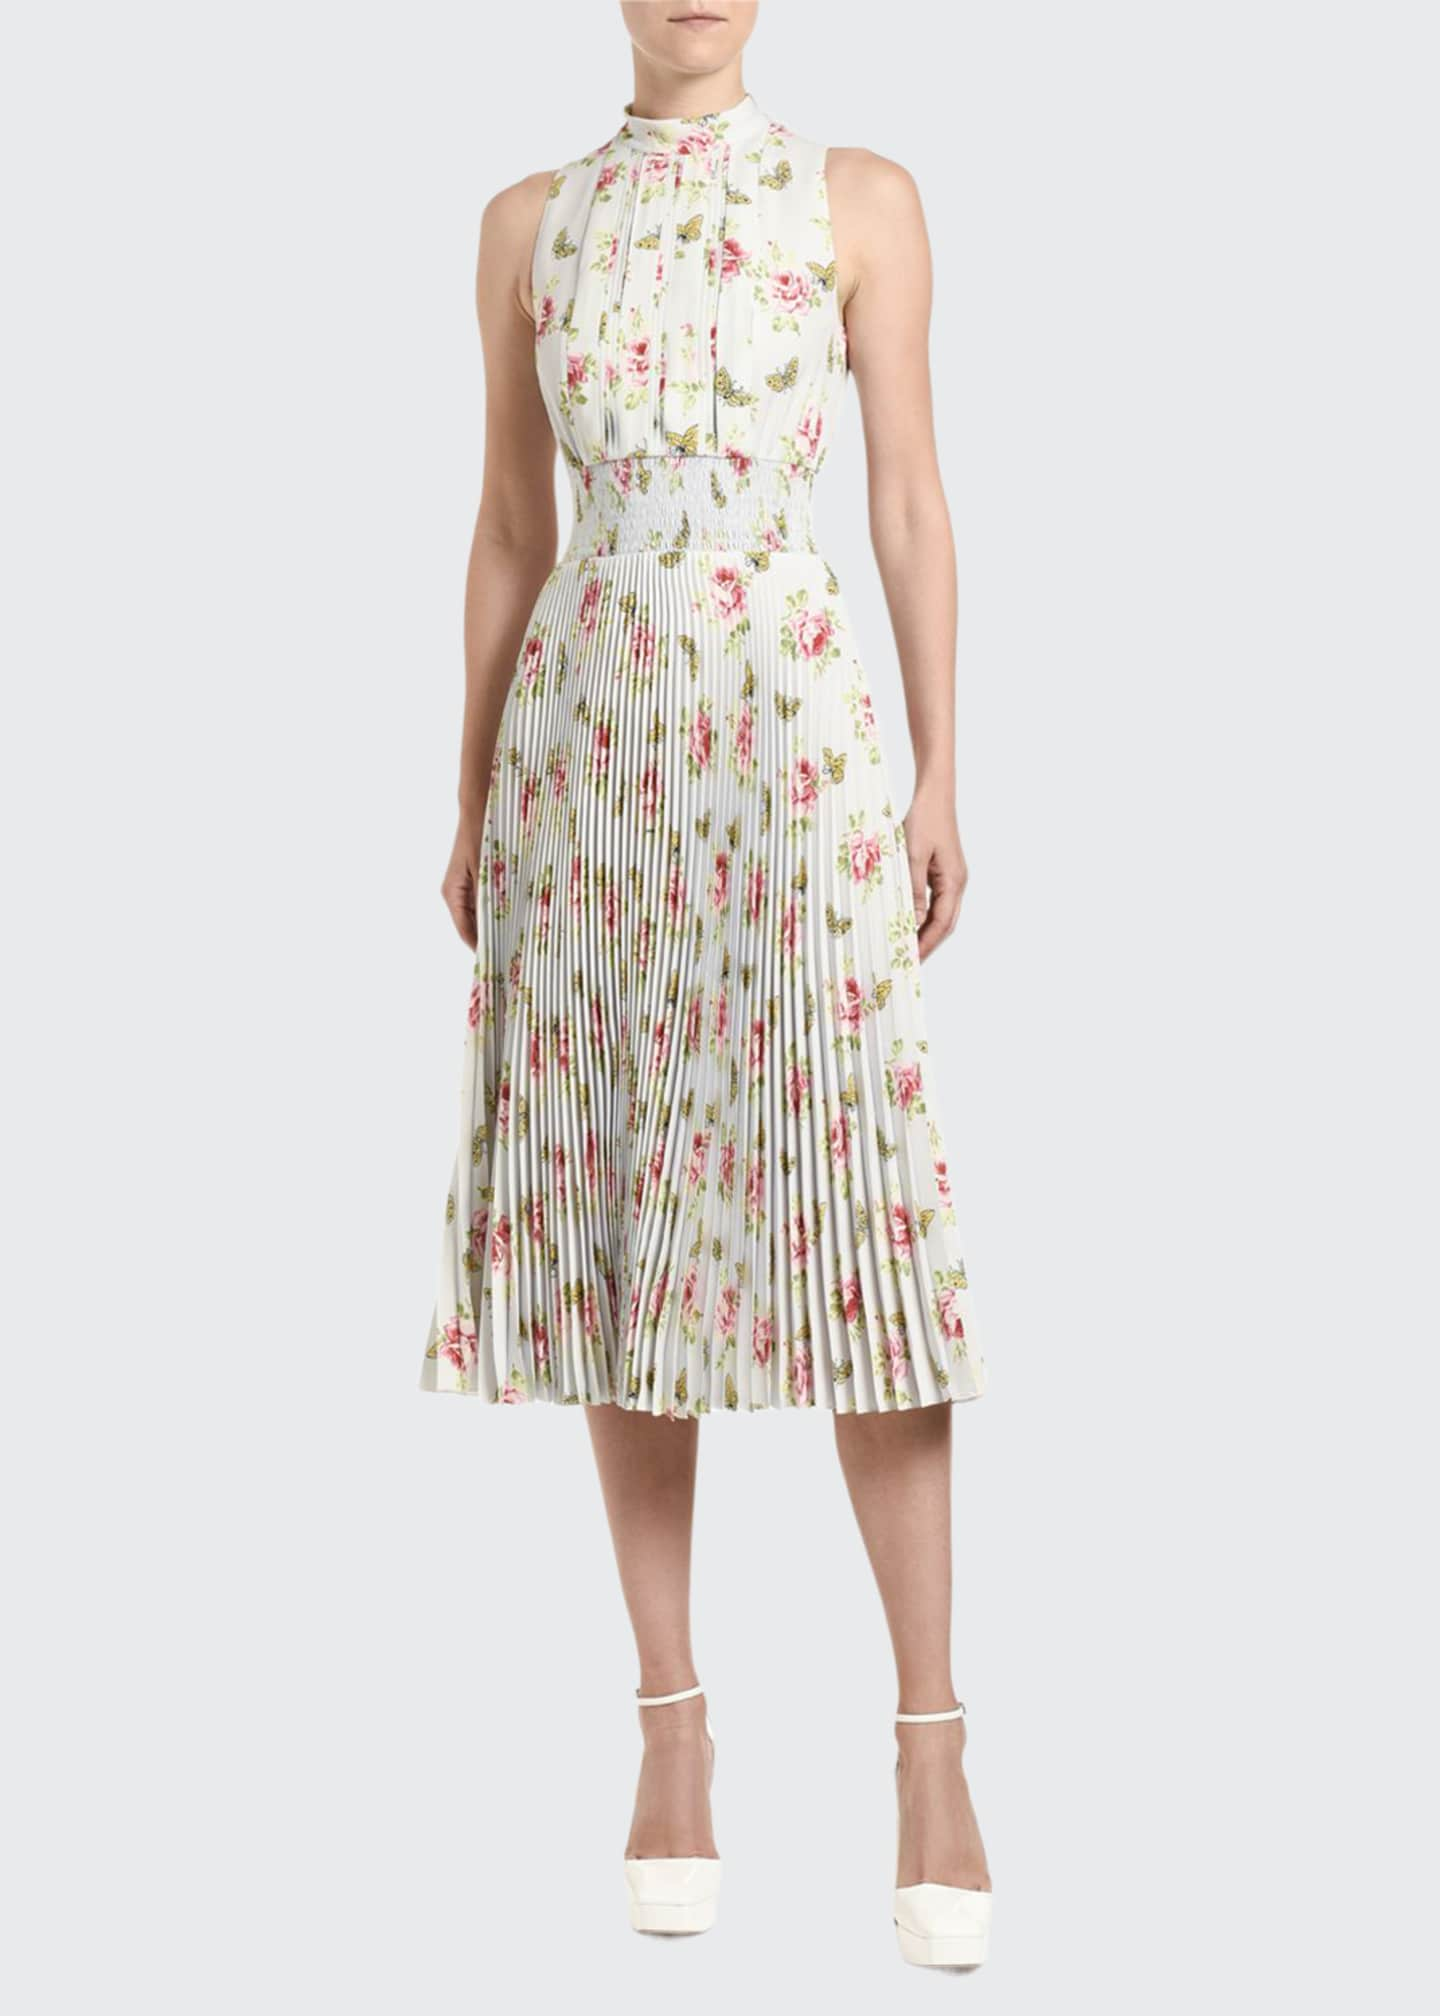 Prada Floral-Print Sleeveless Crepe High-Neck Dress